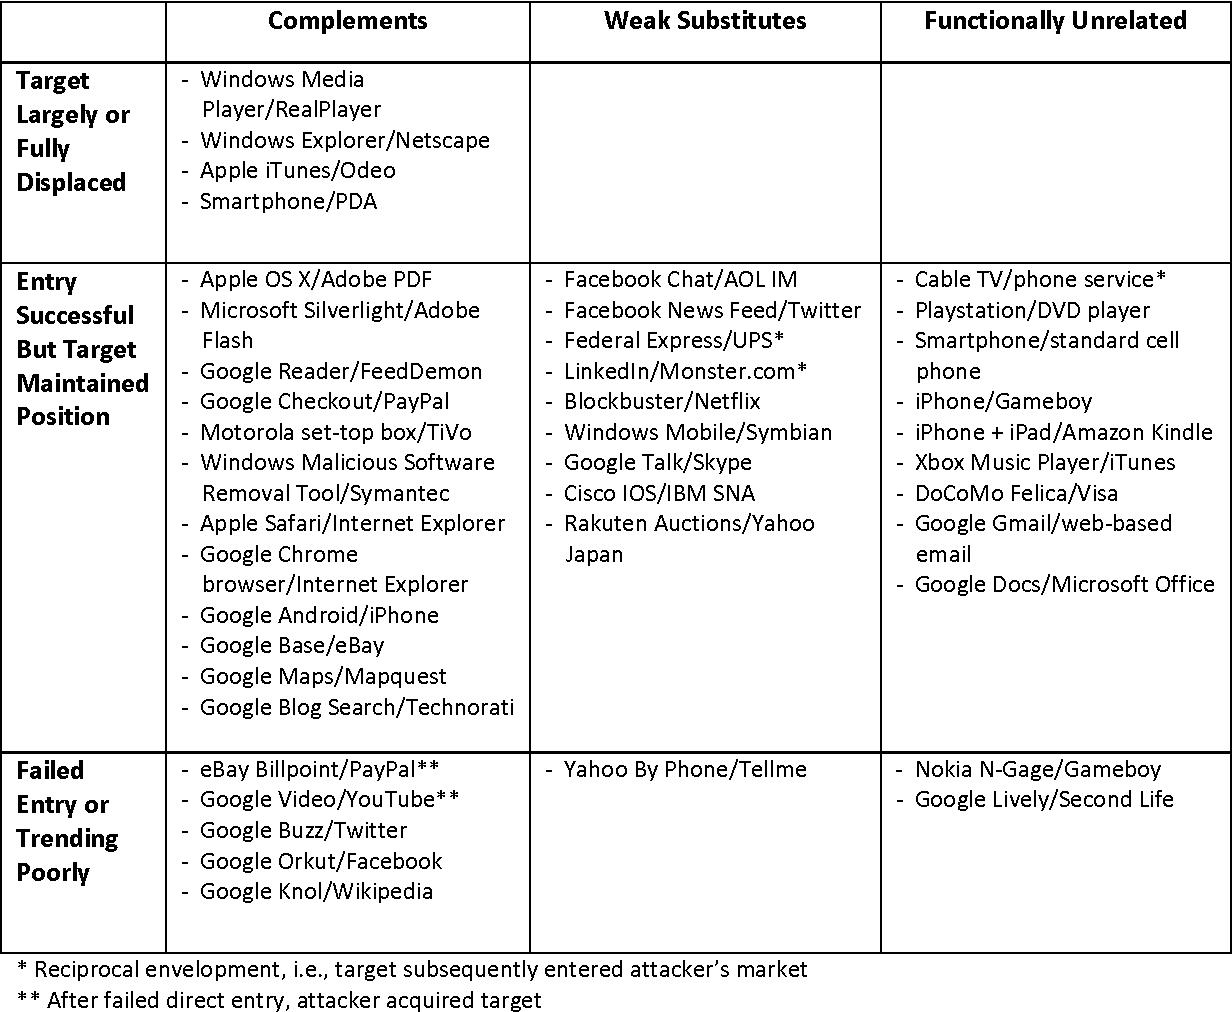 Table 1 from Platform Envelopment - Semantic Scholar